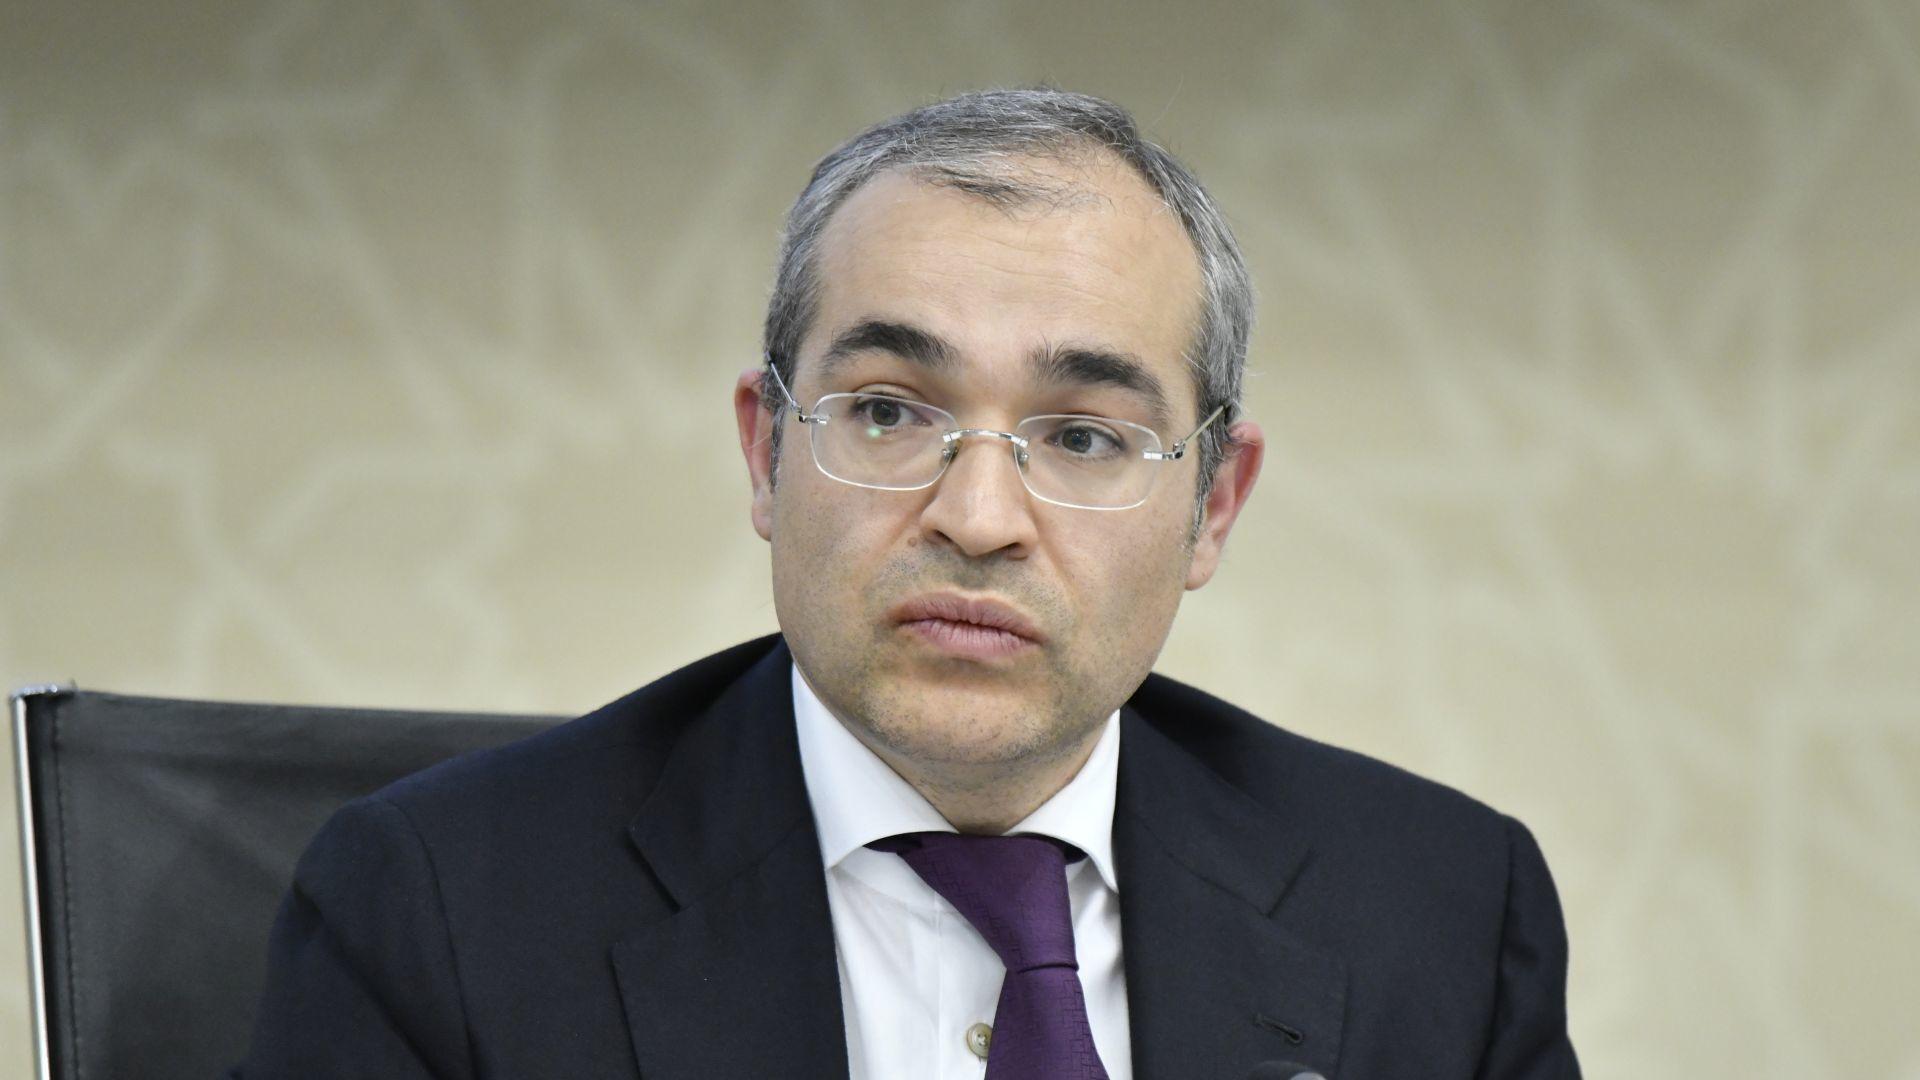 Министр экономики Микаил Джаббаров - Sputnik Азербайджан, 1920, 23.09.2021